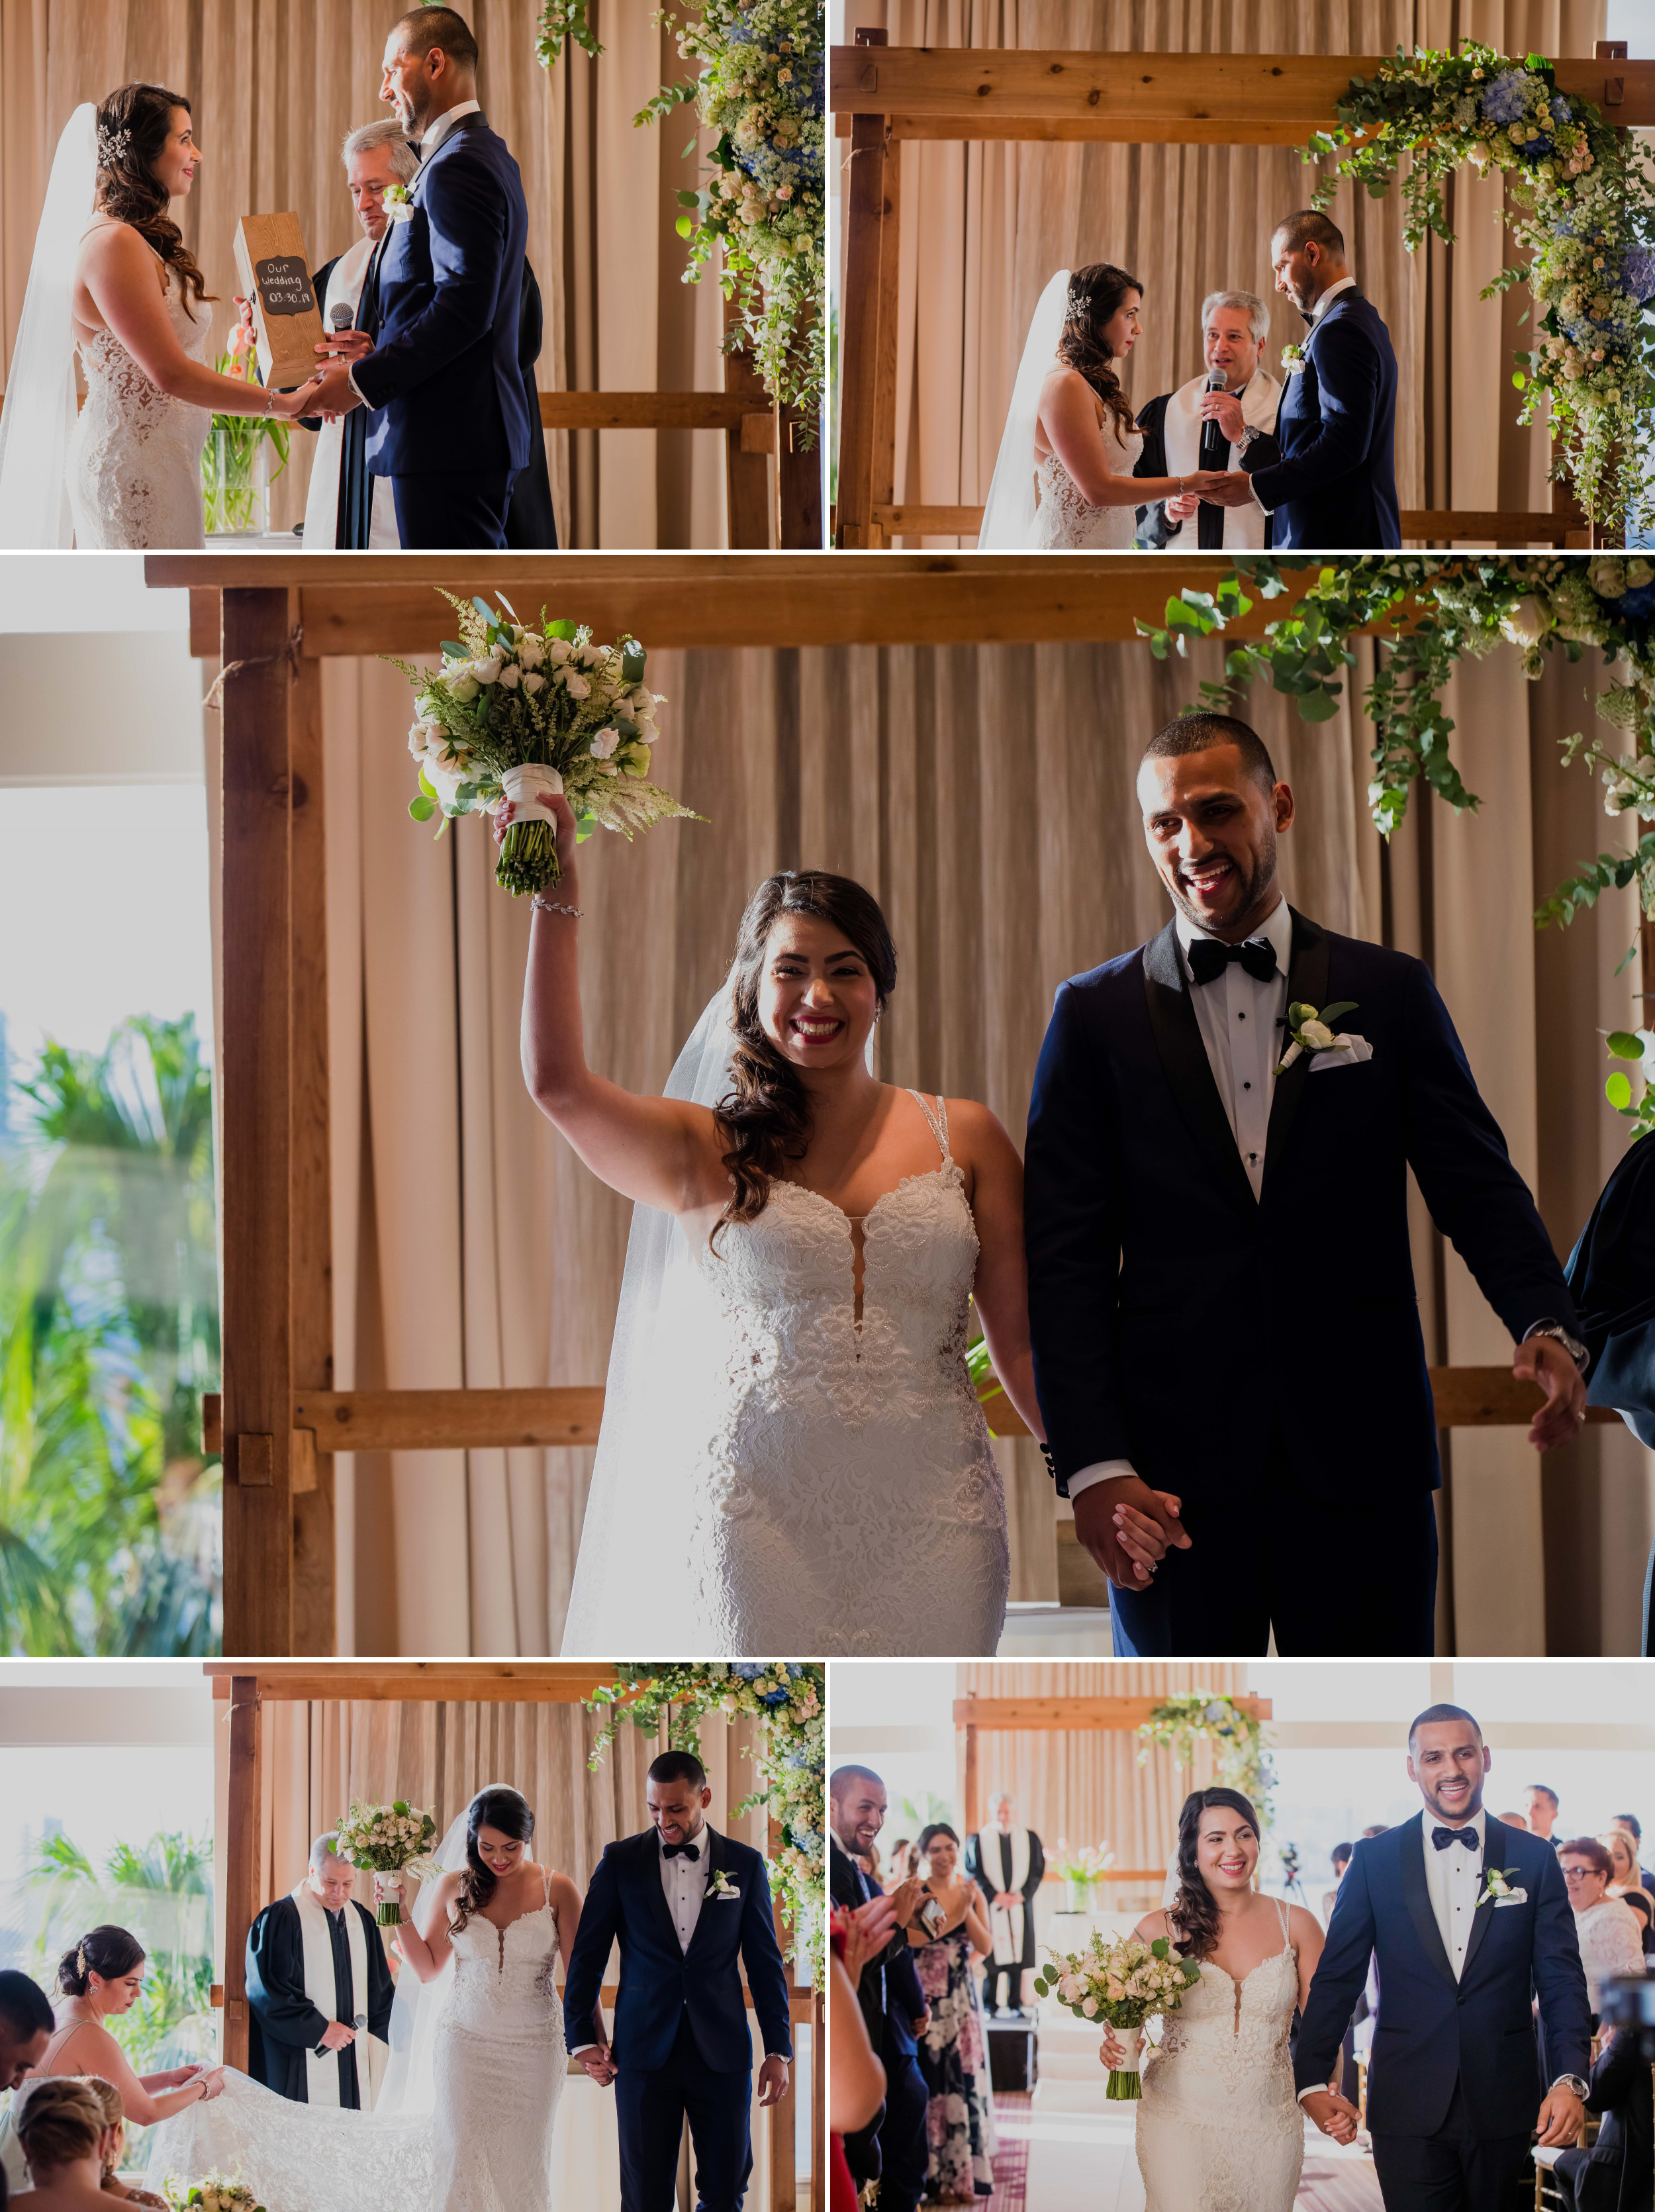 Wedding - Rusty Pelican - Key Biscayne - Santy Martinez Photography 32.jpg